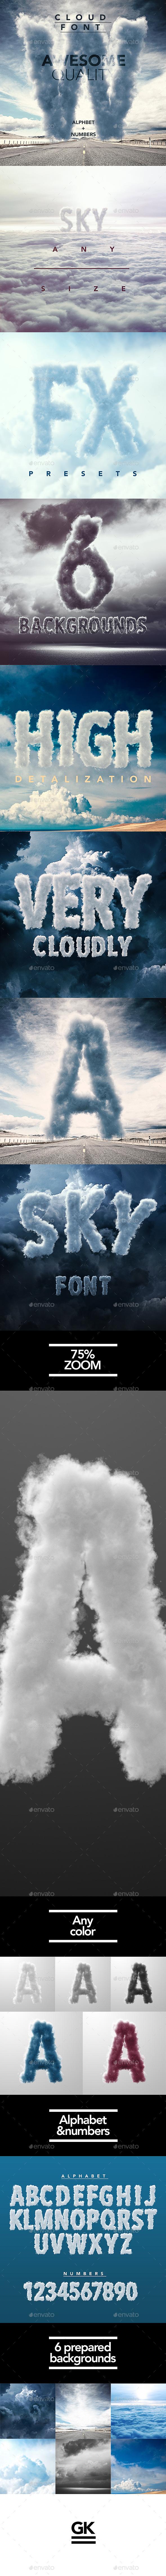 3D Sky / Cloud font mock up - Miscellaneous Product Mock-Ups